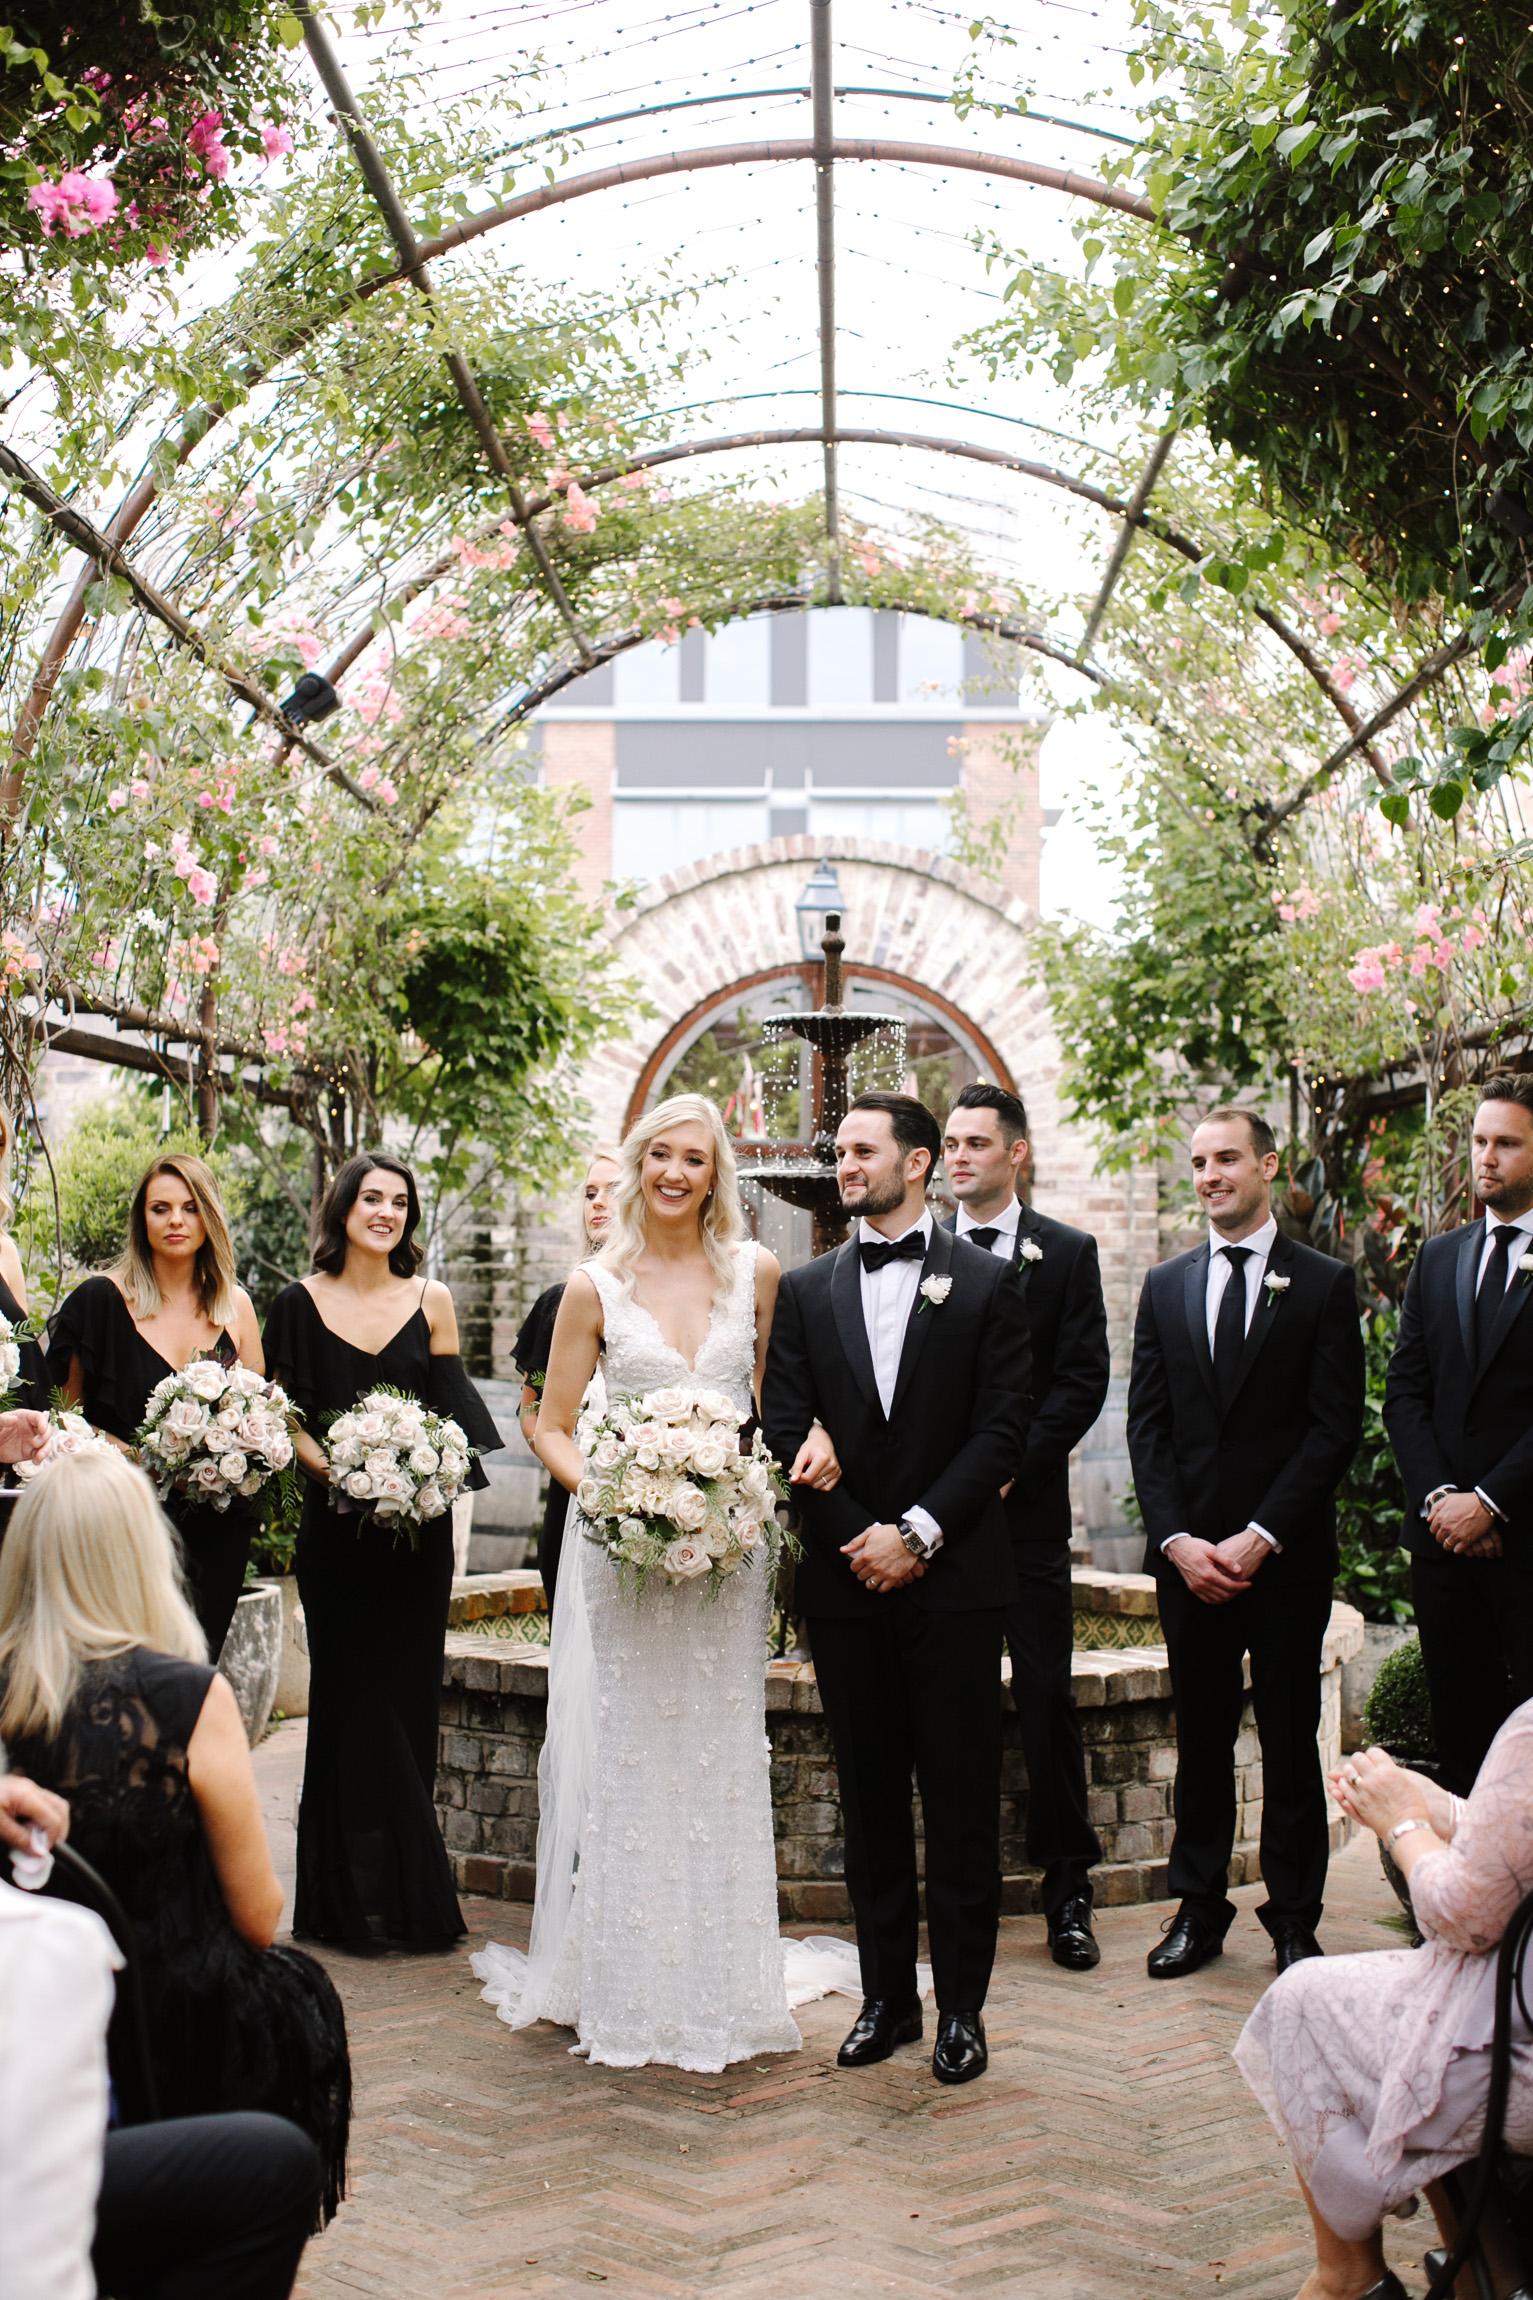 180223_justinaaron_wedding_charlotte_david_h-135.jpg